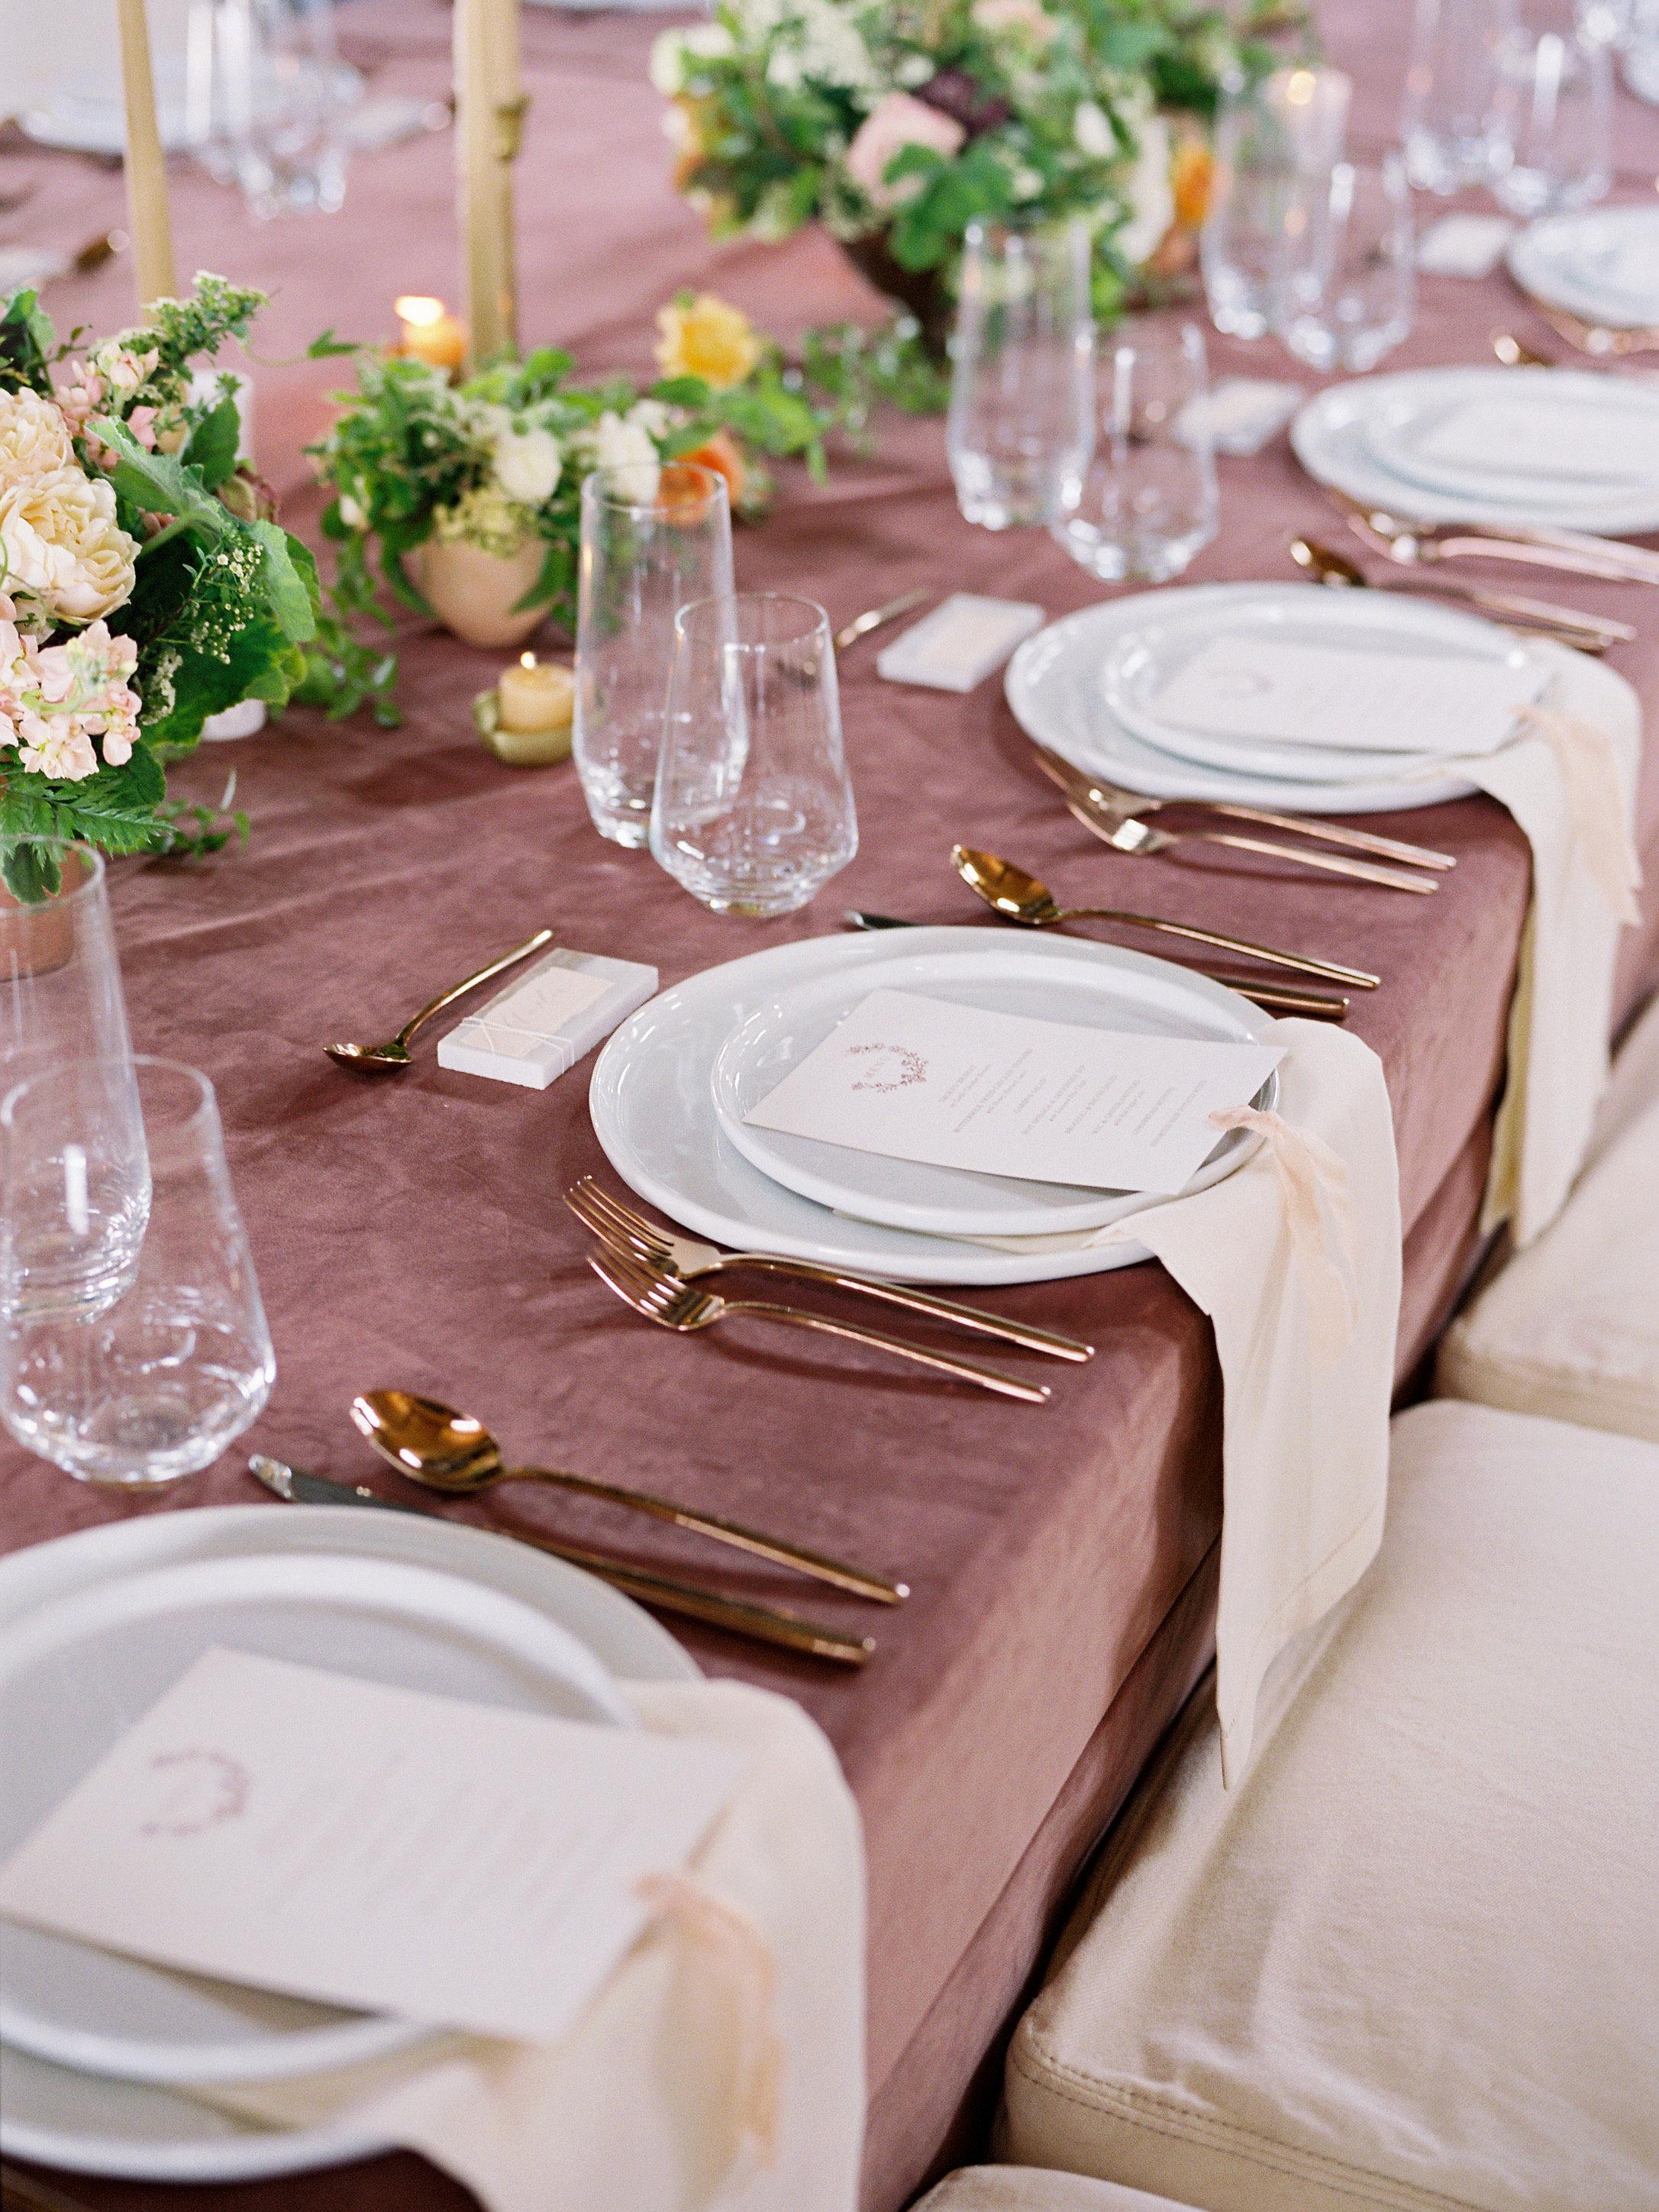 wedding table place setting ceramic dinnerware copper flatware